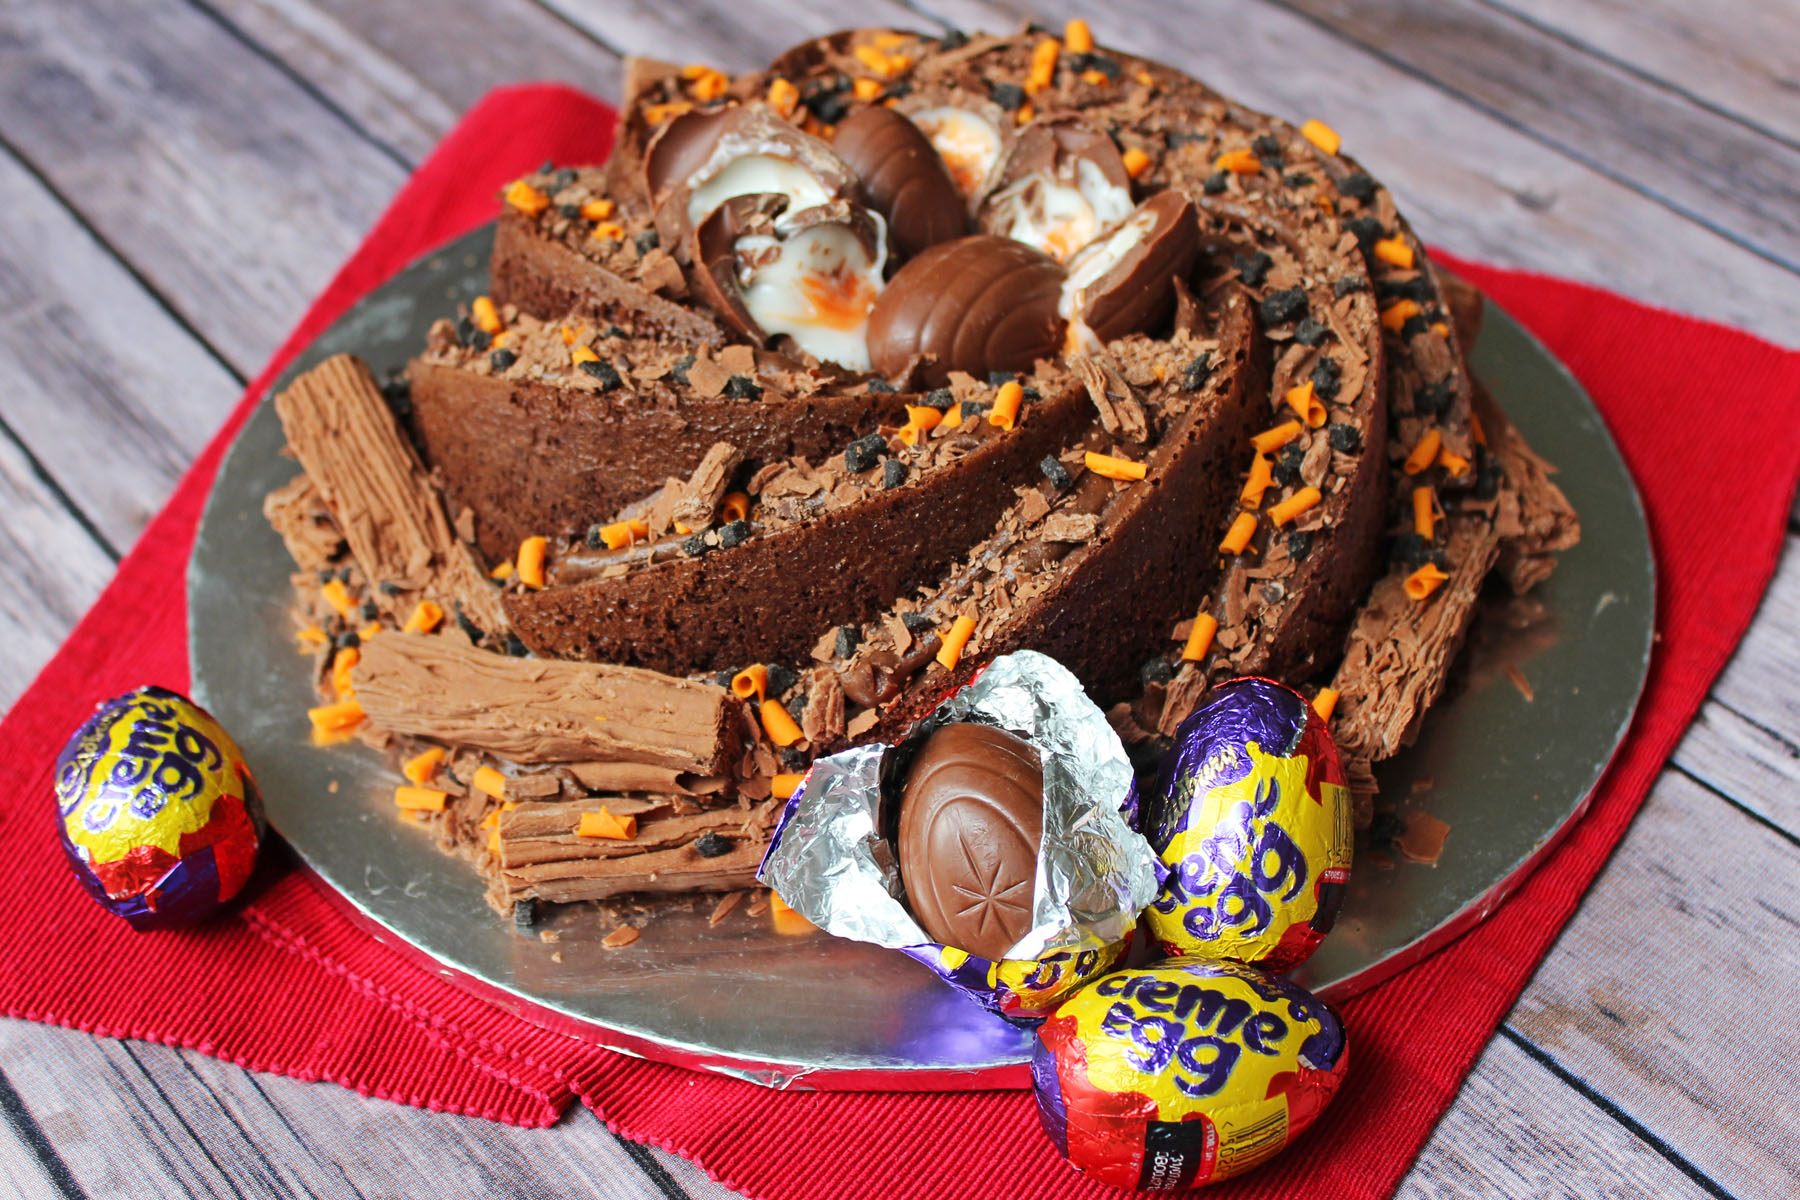 Cadbury's Creme Egg Bundt Cake